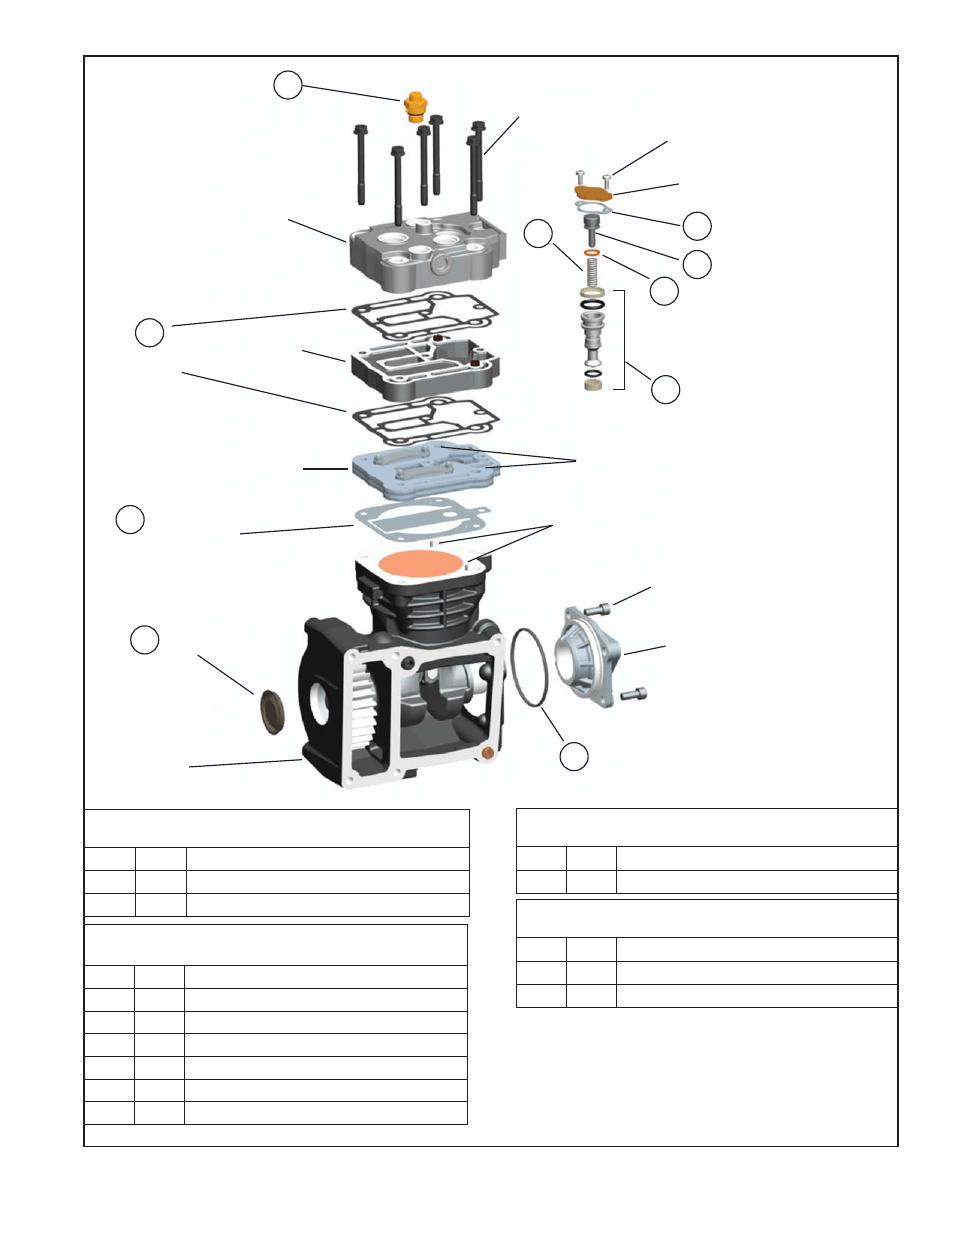 8n Firing Order Diagram Within Ford 9N Parts Diagram